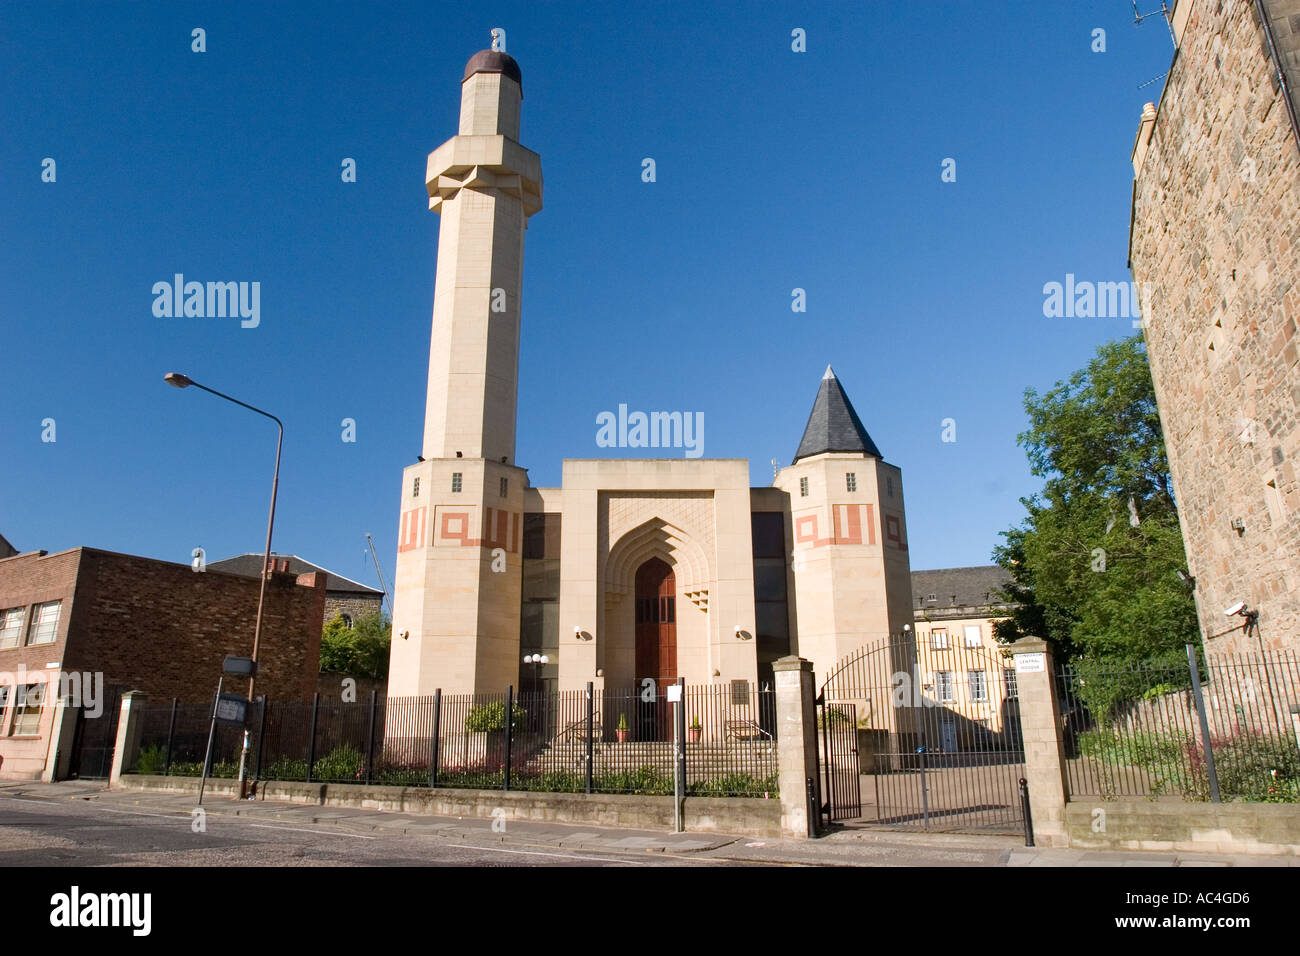 Edinburgh Central Mosque and Islamic Centre, Scotland, UK Stock Photo